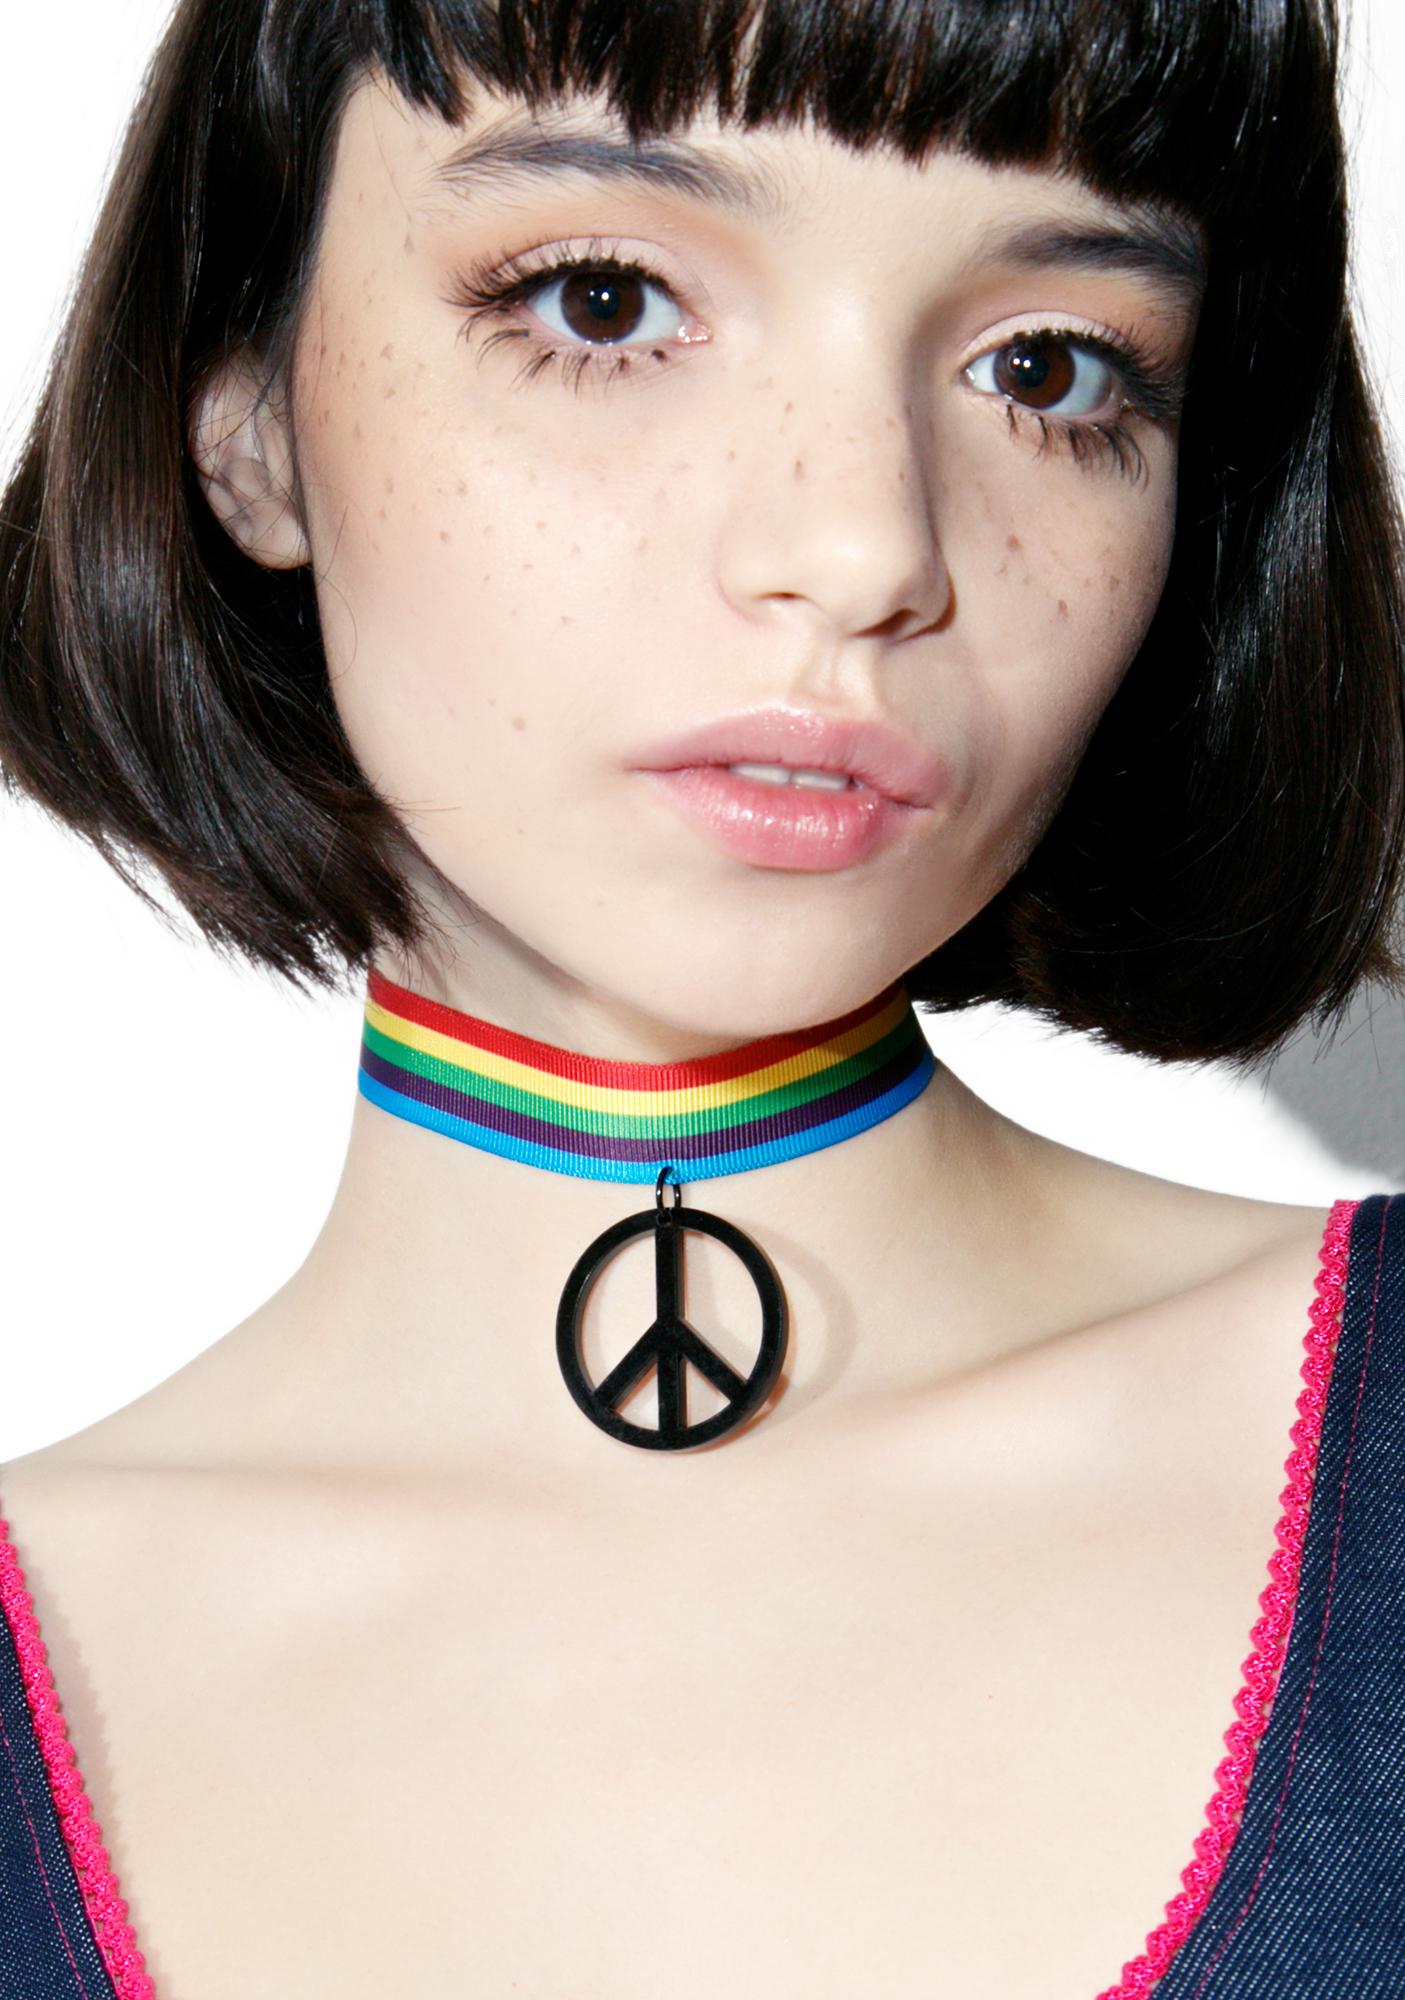 Suzywan Deluxe Peace And Love Choker